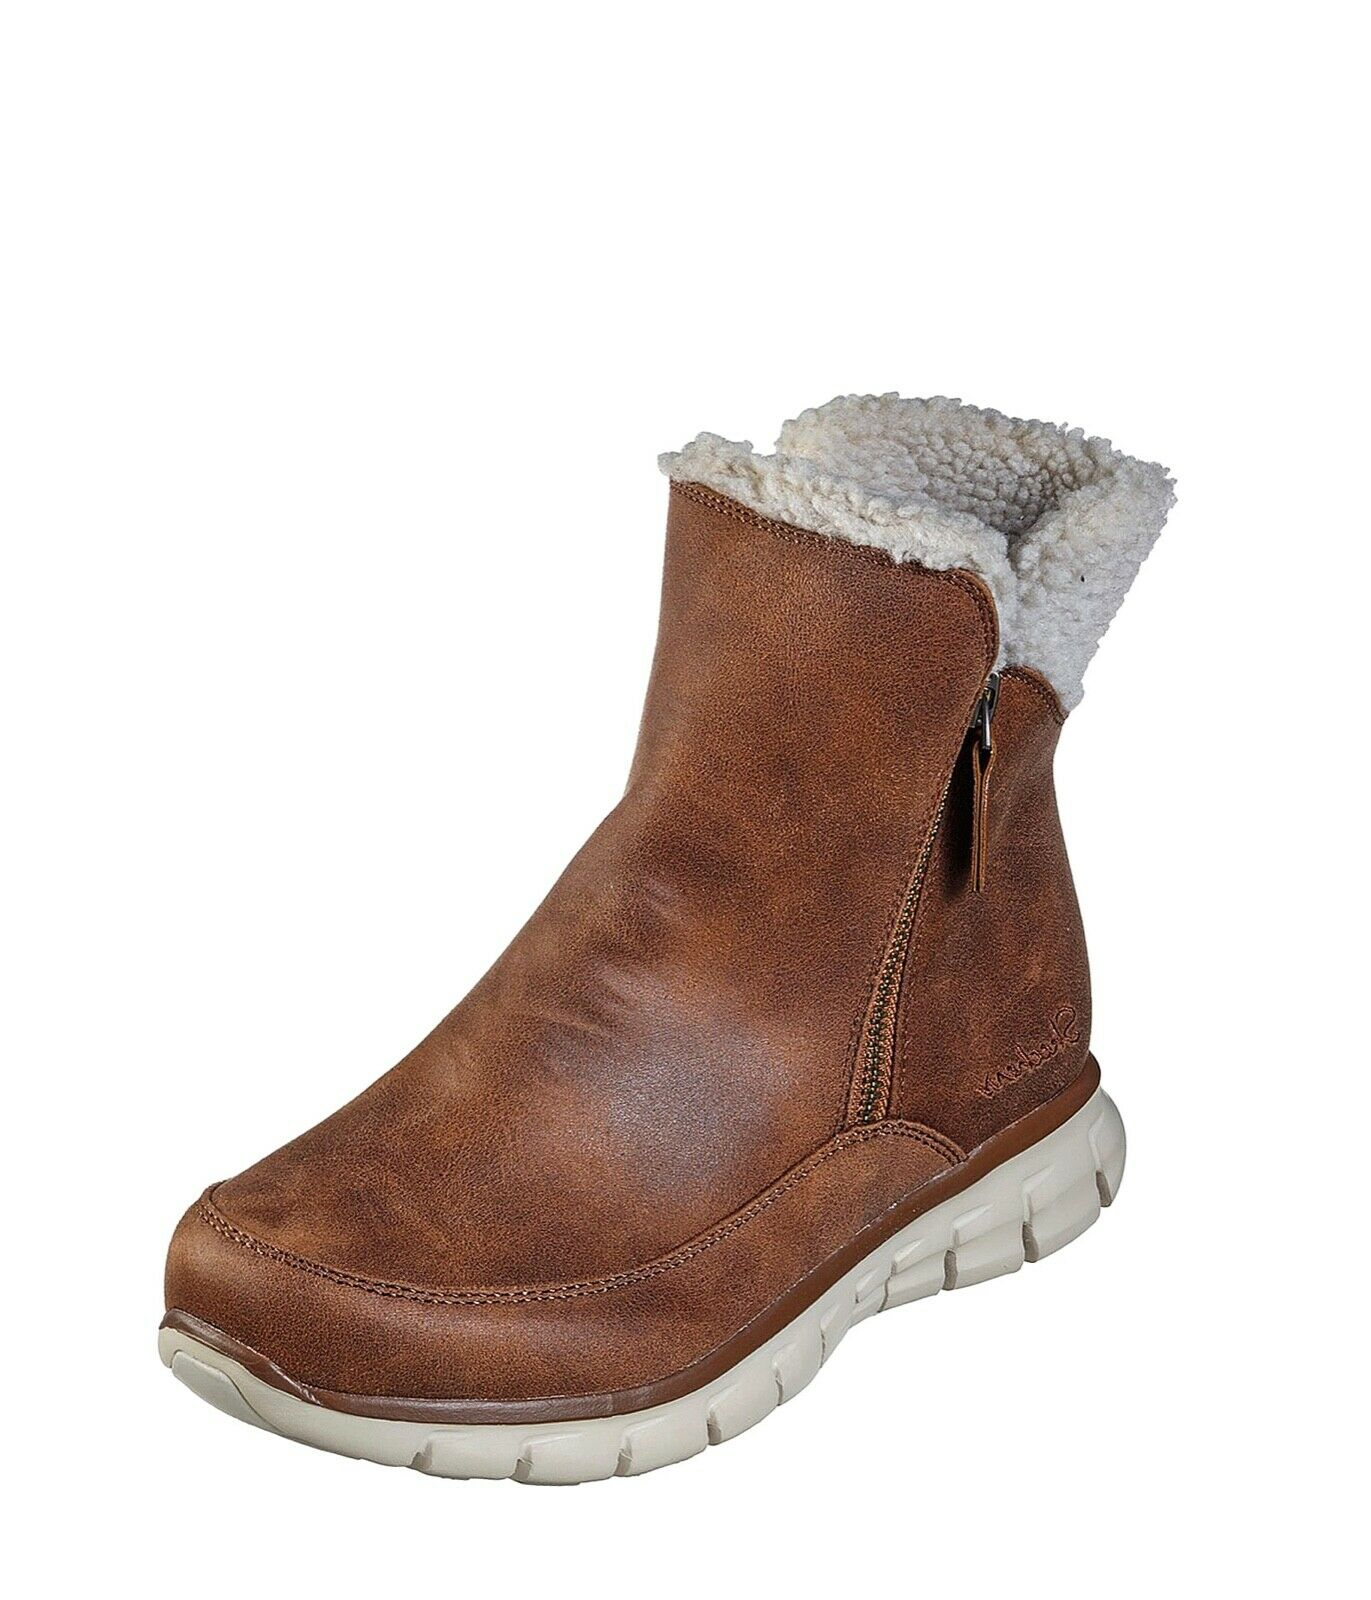 Skechers NEW Synergy Collab chestnut tan memory foam faux fleece ankle Stiefel 3-8